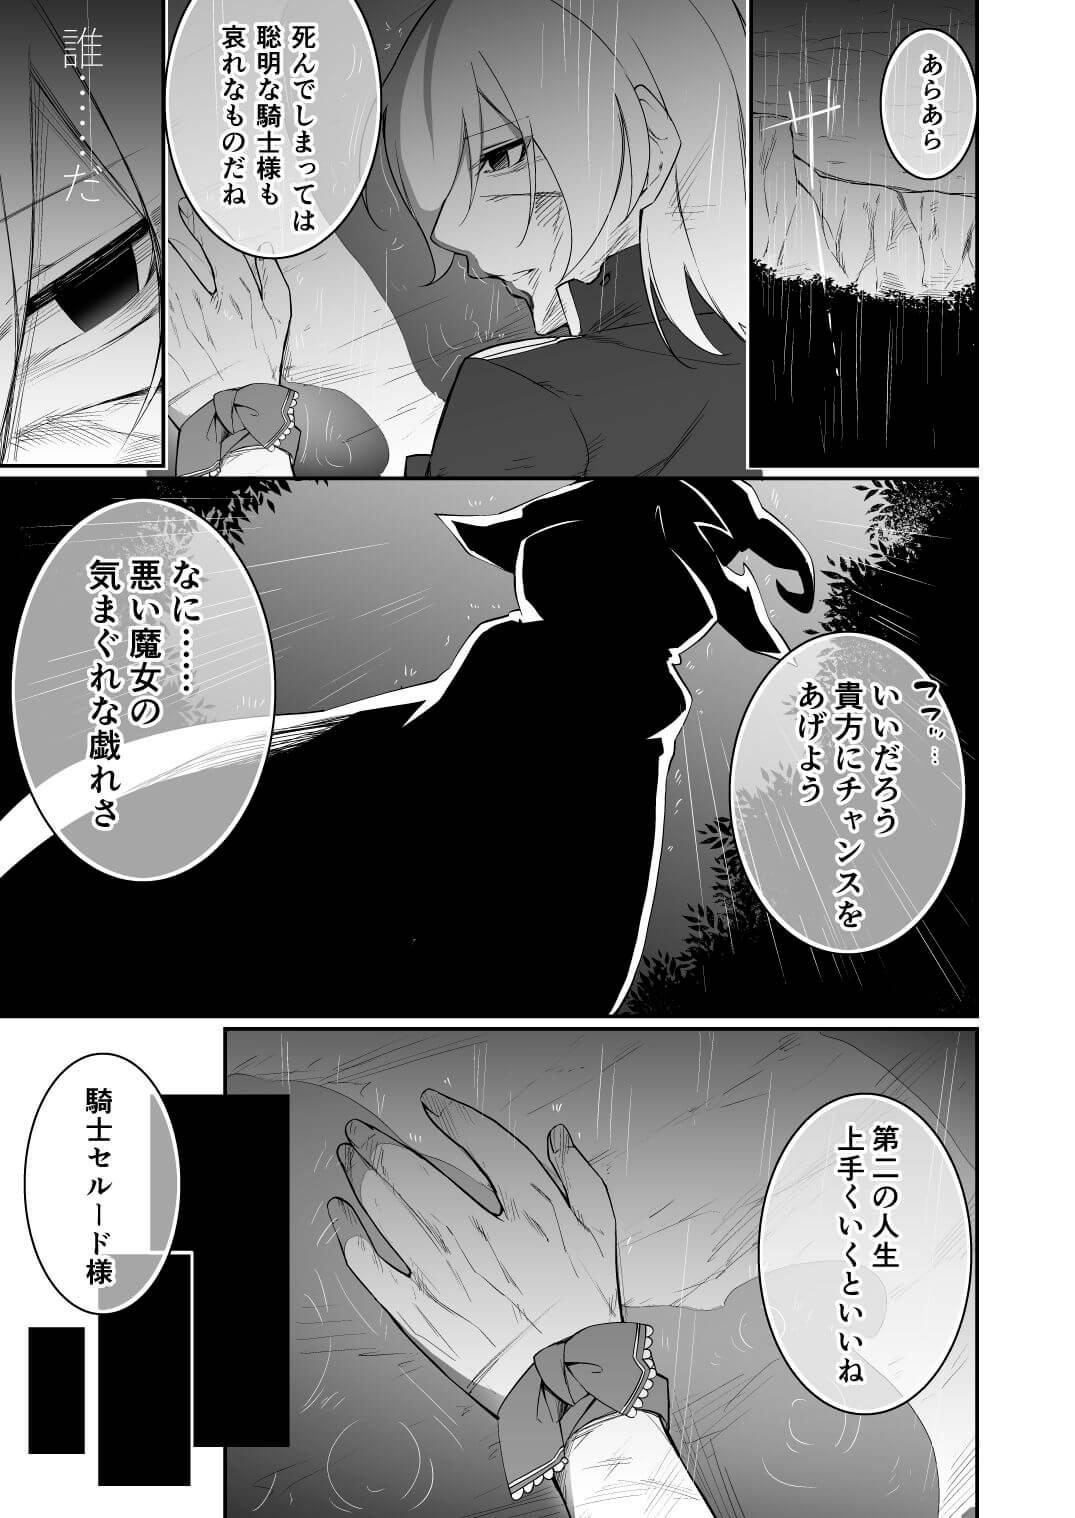 【TS転生騎士とある貴族の約束】死の間際に謎の魔女の手で転生した騎士のお話です。